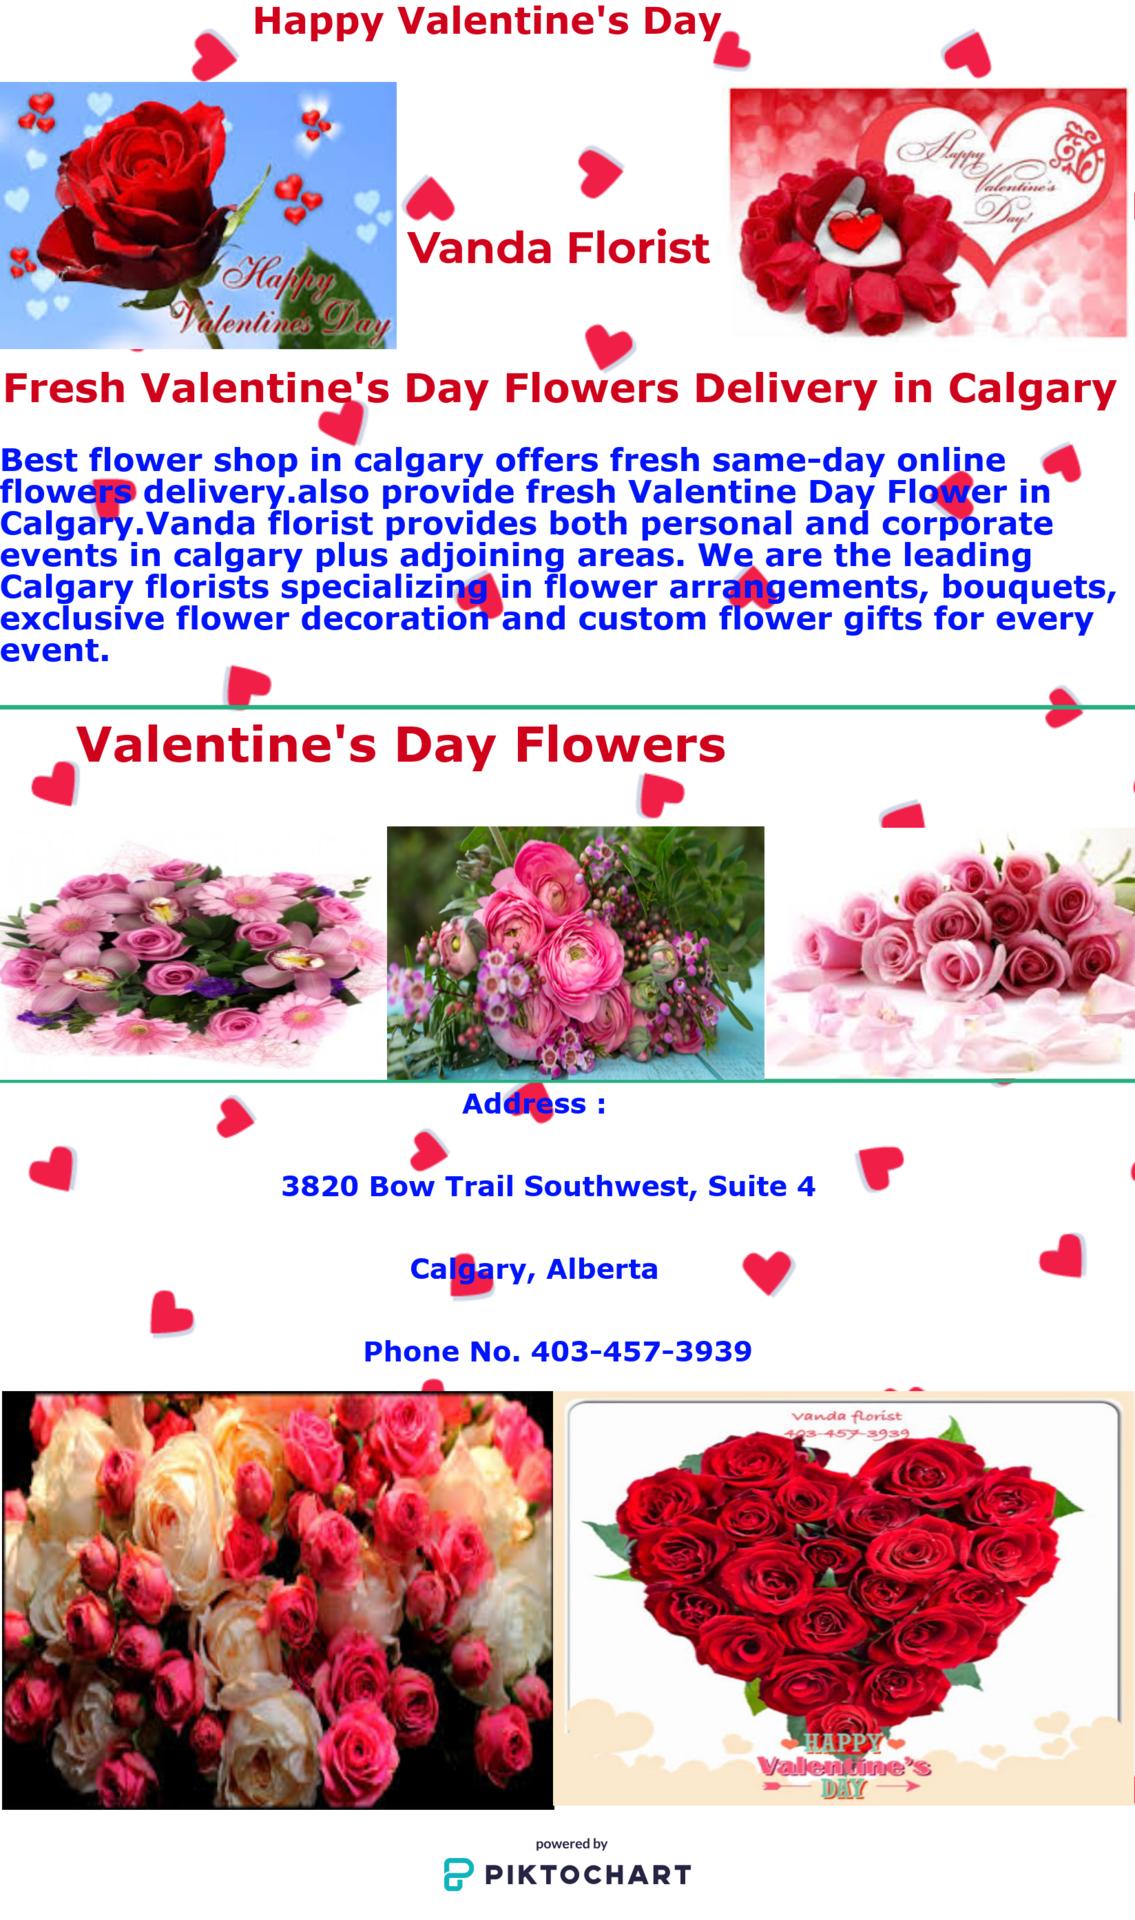 Vanda florist local calgary flower shop best flower shop in best flower shop in calgary offers fresh same day online flowers deliveryso provide izmirmasajfo